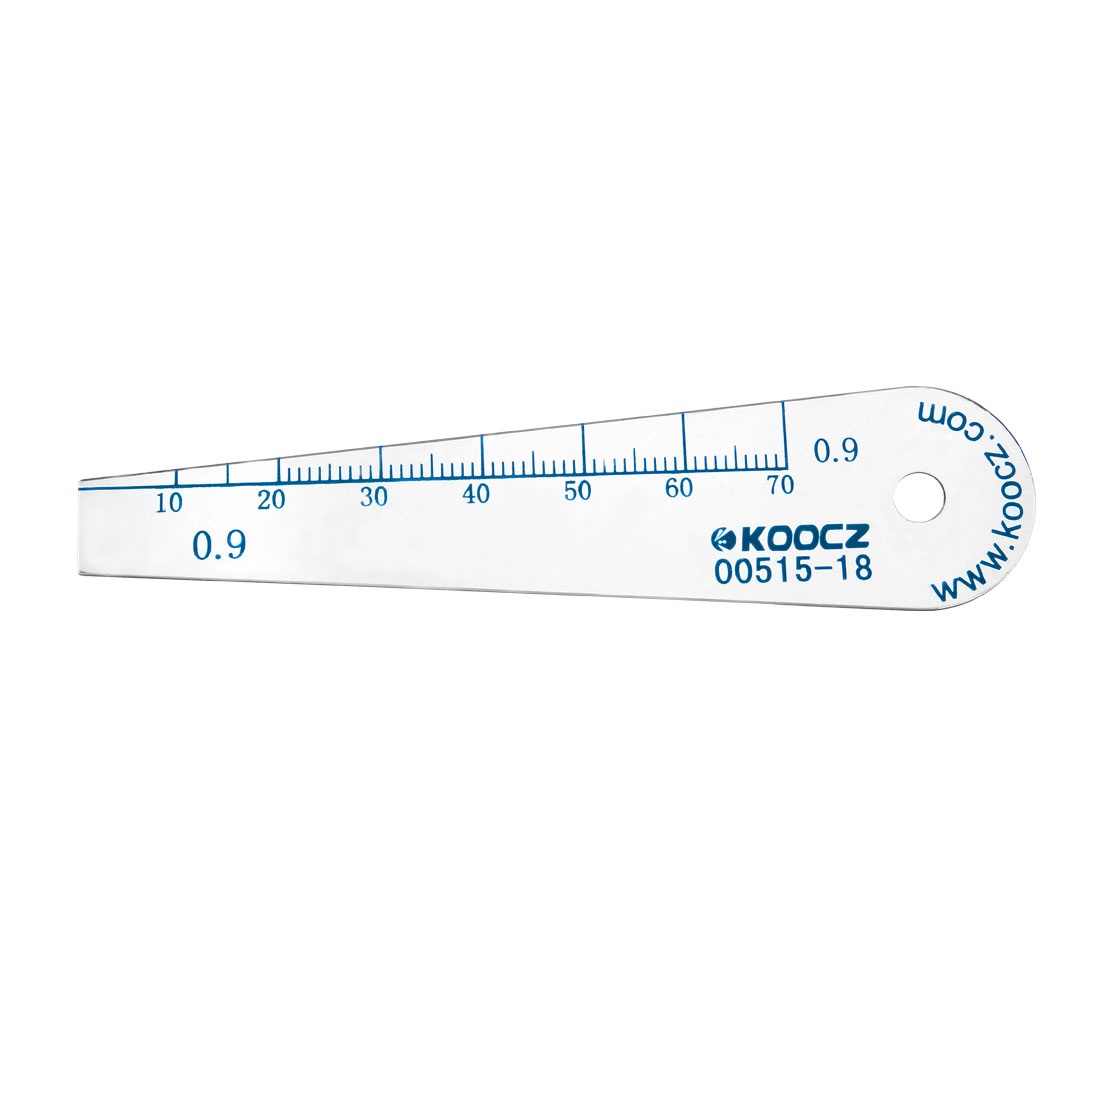 Metric Thickness Feeler Gauge 0.9mm Plastic Measuring Tool for Gap Width